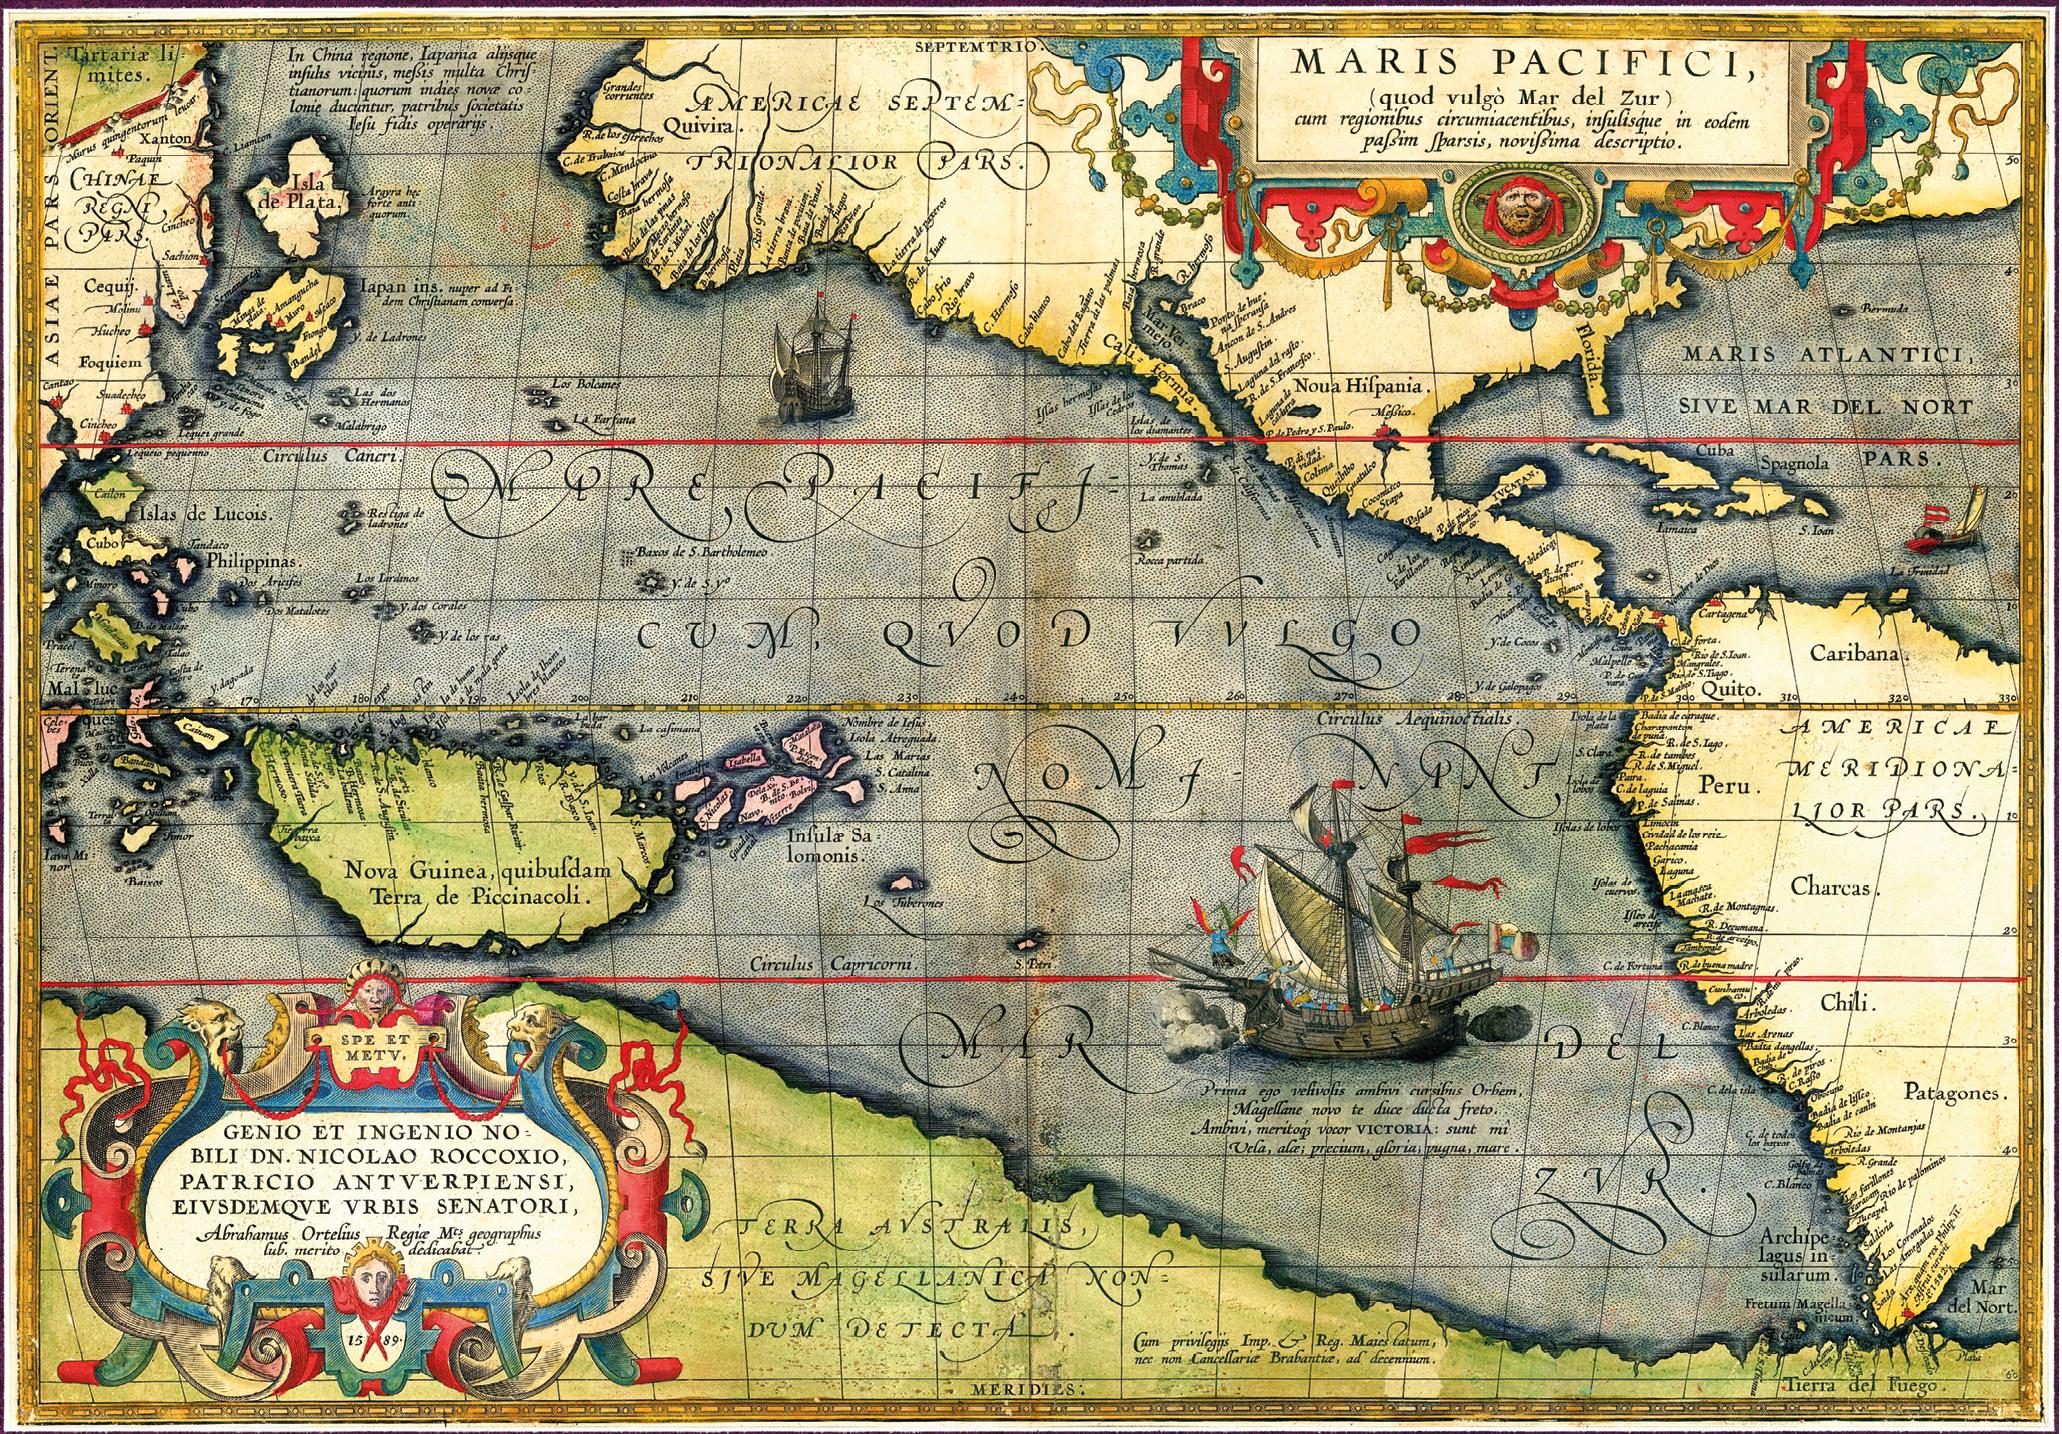 Mapa do Oceano Pacífico com a caravela Victoria. Abraham Ortelius, 1589. https://commons.wikimedia.org